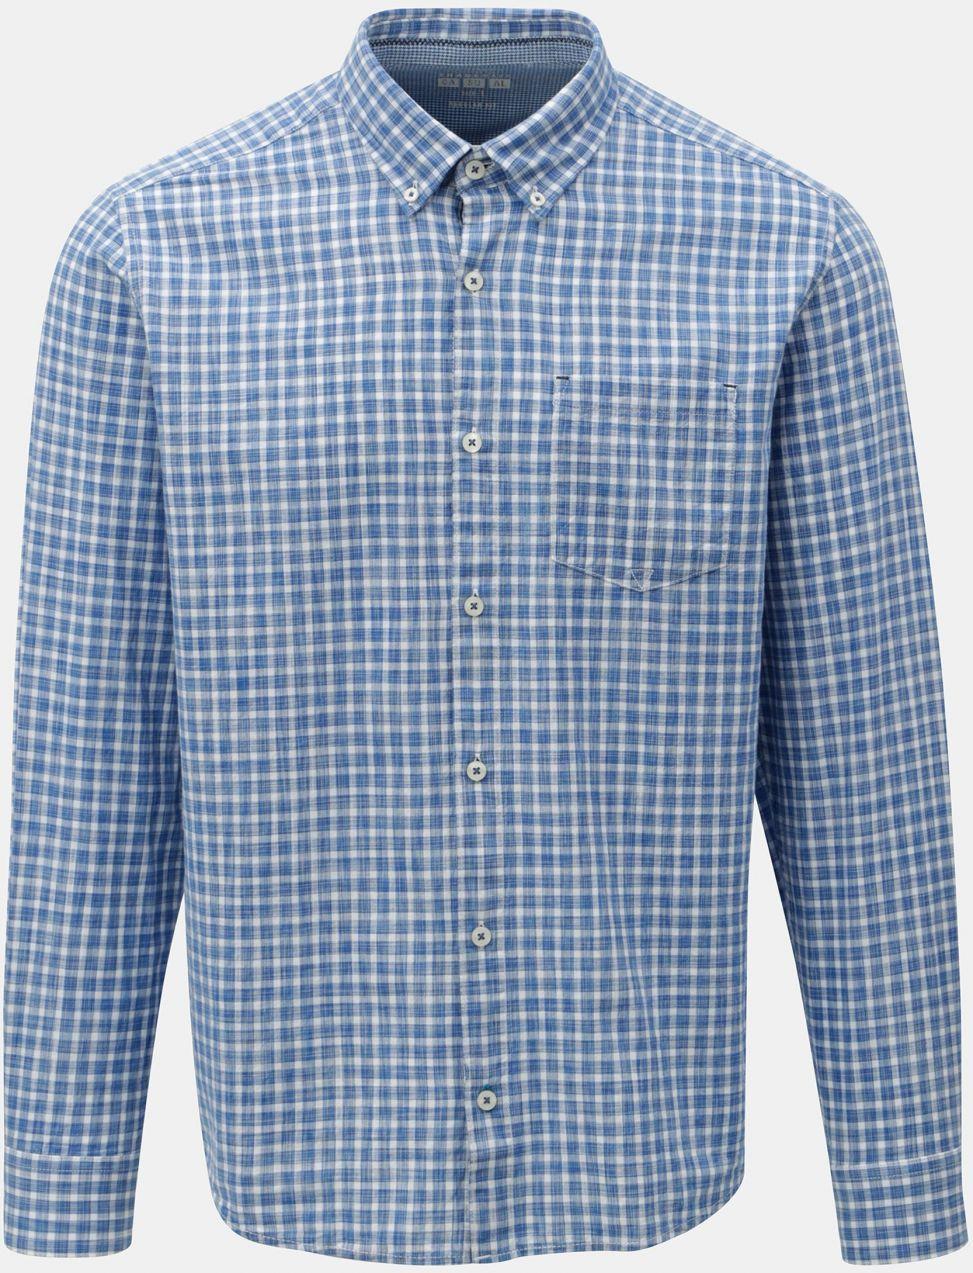 be4336b51a43 Bielo-modrá pánska kockovaná regular fit košeľa s.Oliver značky s.Oliver -  Lovely.sk